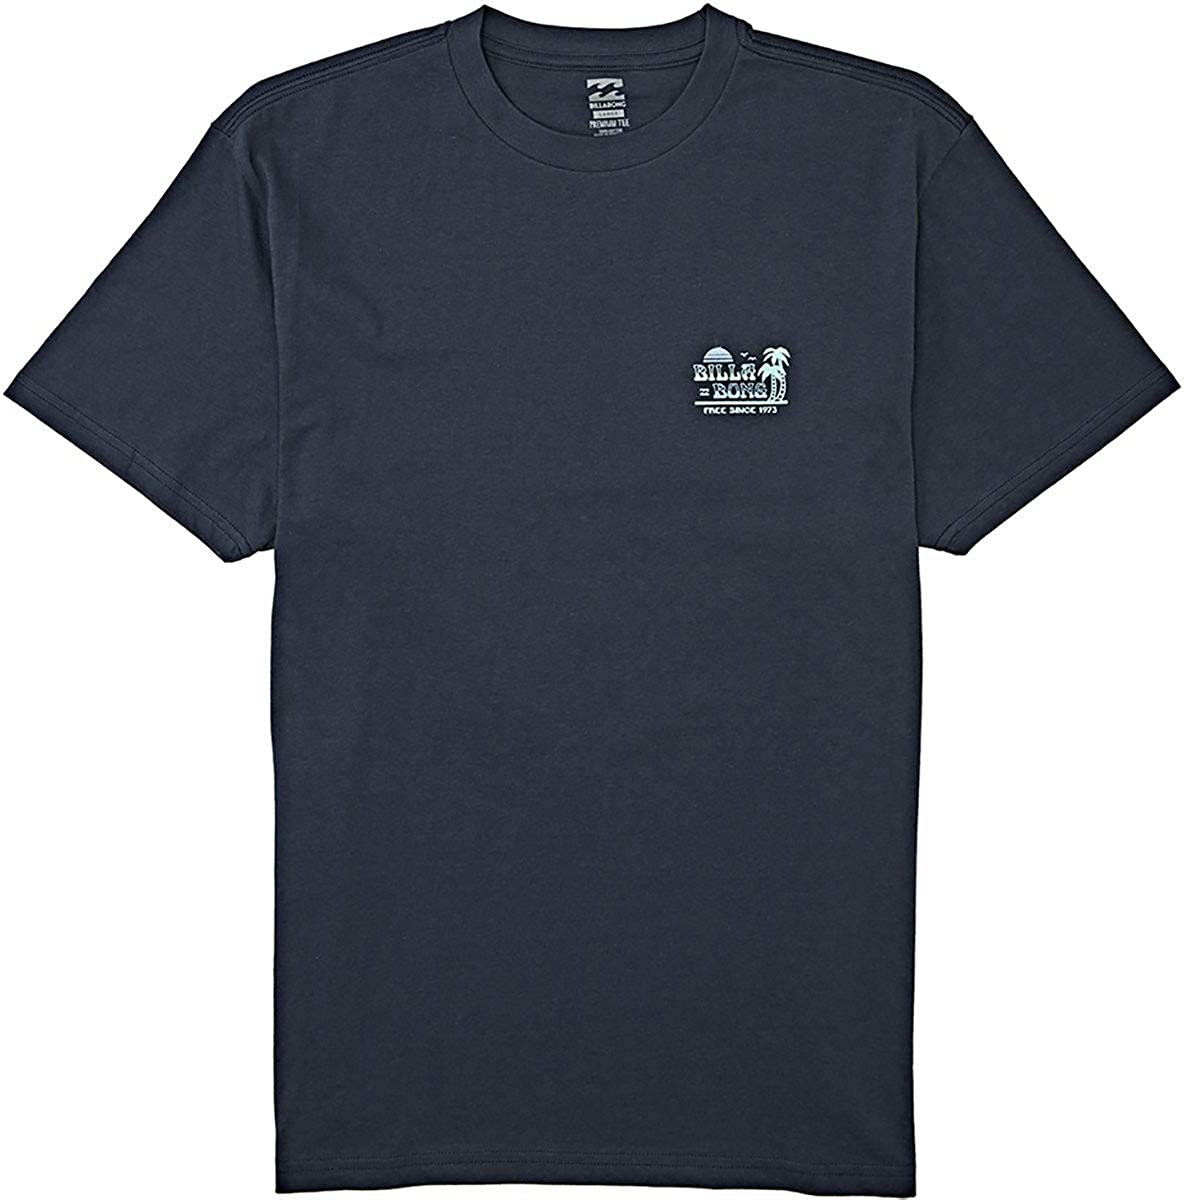 Billabong Mens Classic Short Sleeve Premium Logo Graphic T-Shirt